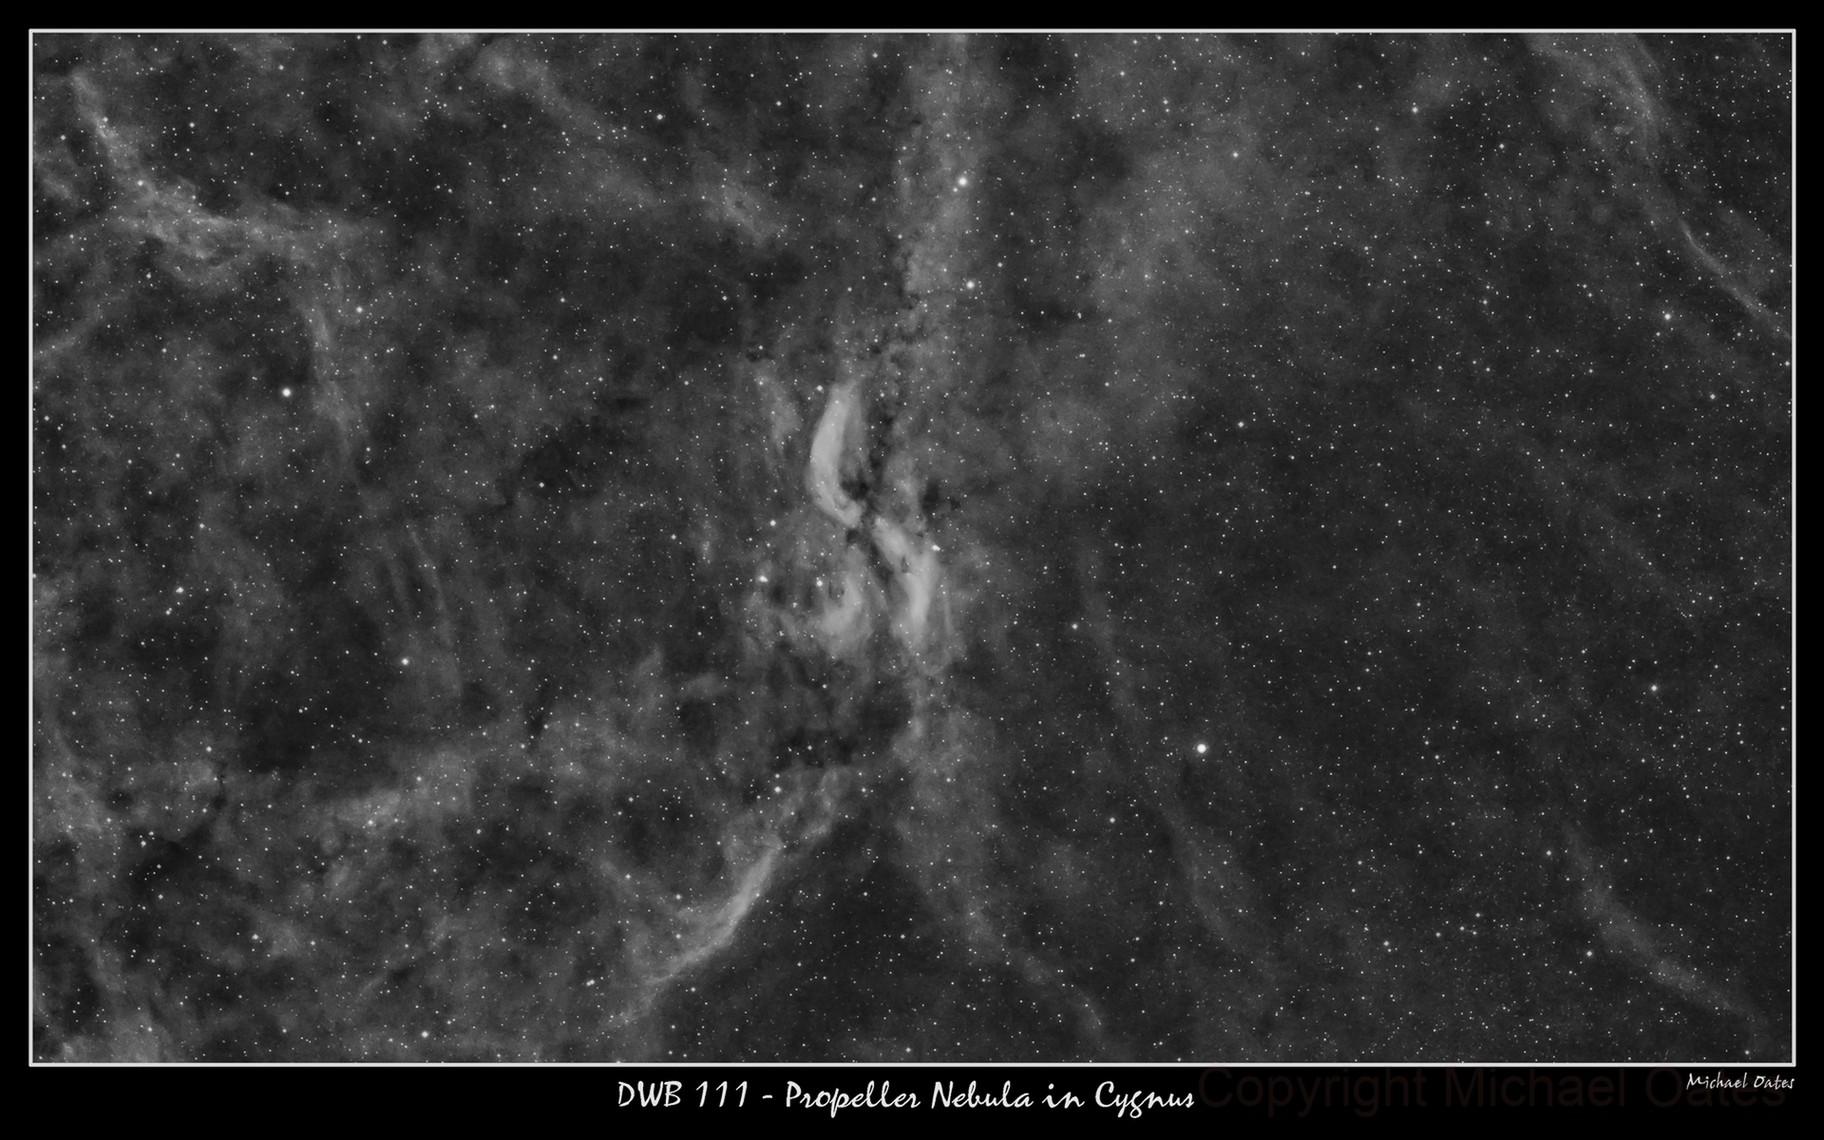 DWB 111 Propeller Nebula in Ha